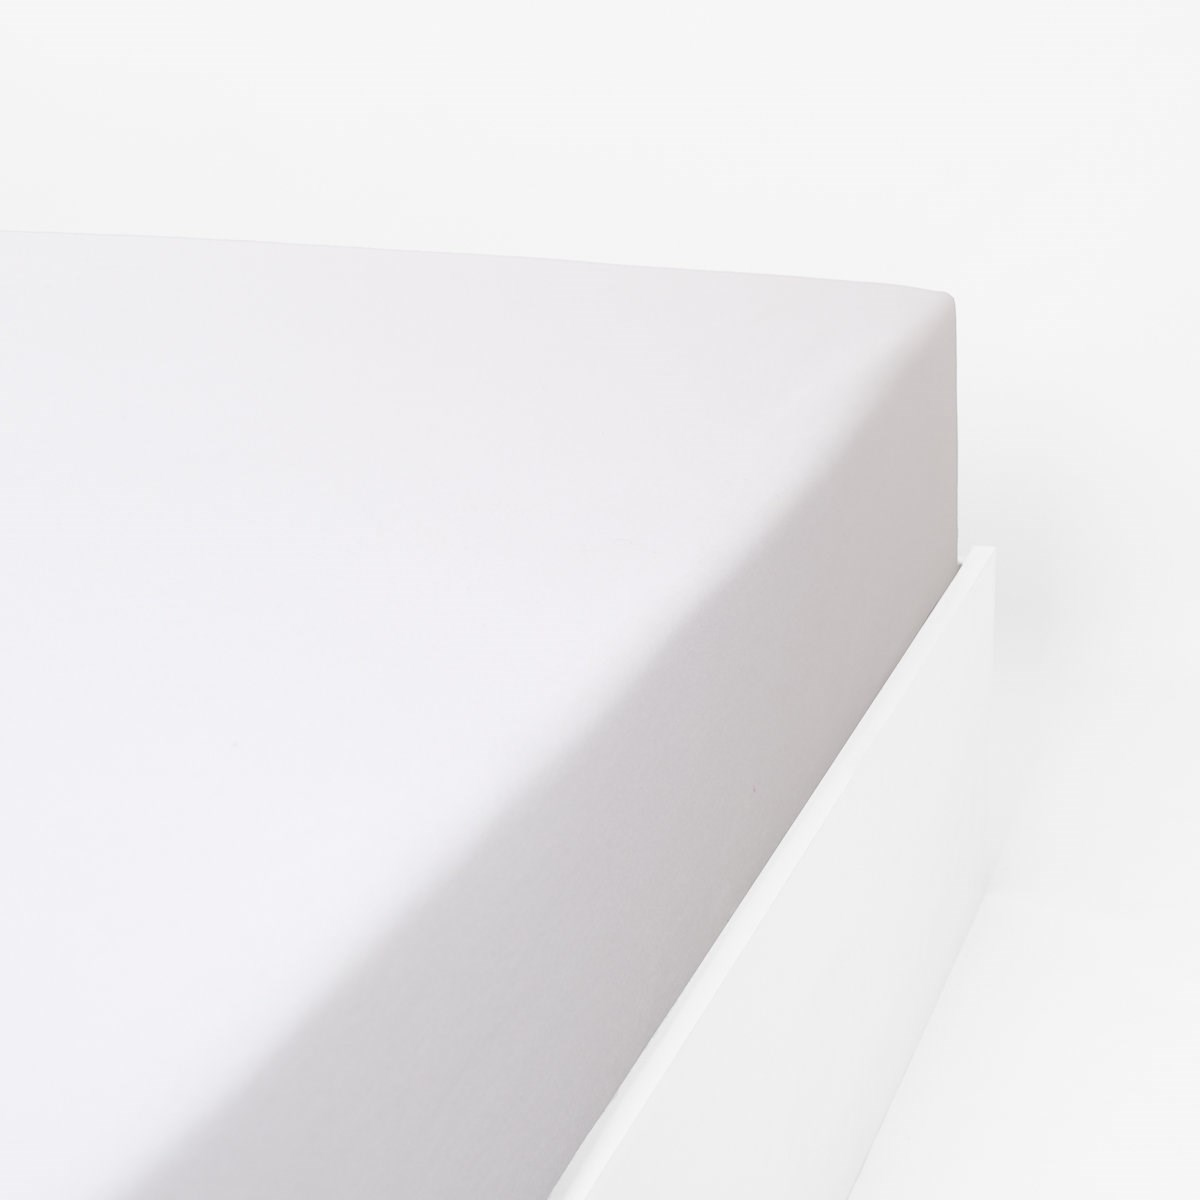 Drap housse flanelle en Molleton Blanc 120x200 cm